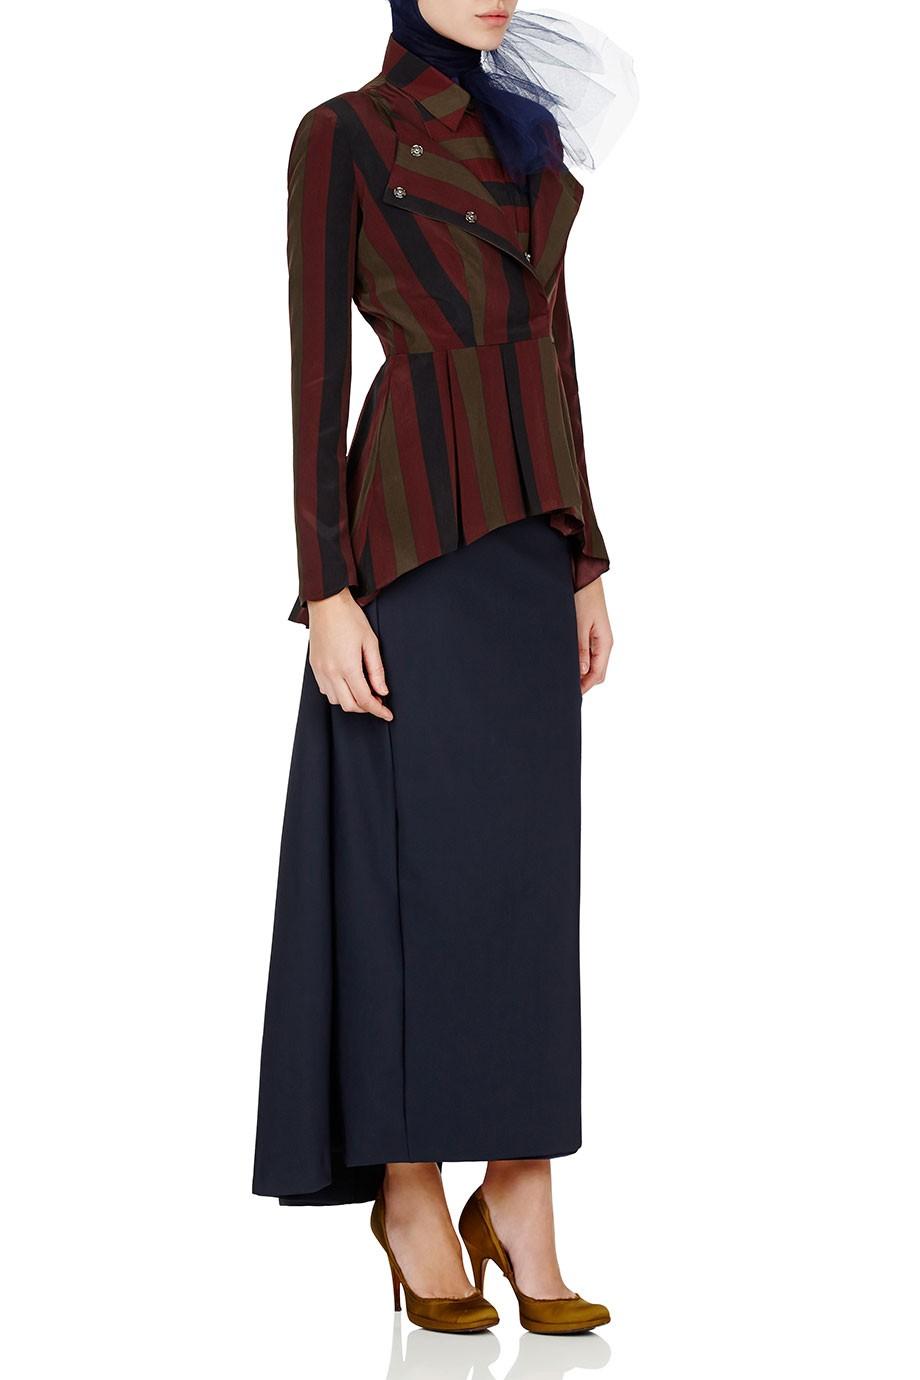 Diana-Kotb-Atlas-Jacket-Stripe-Time-Piece-Skirt-Navy-01